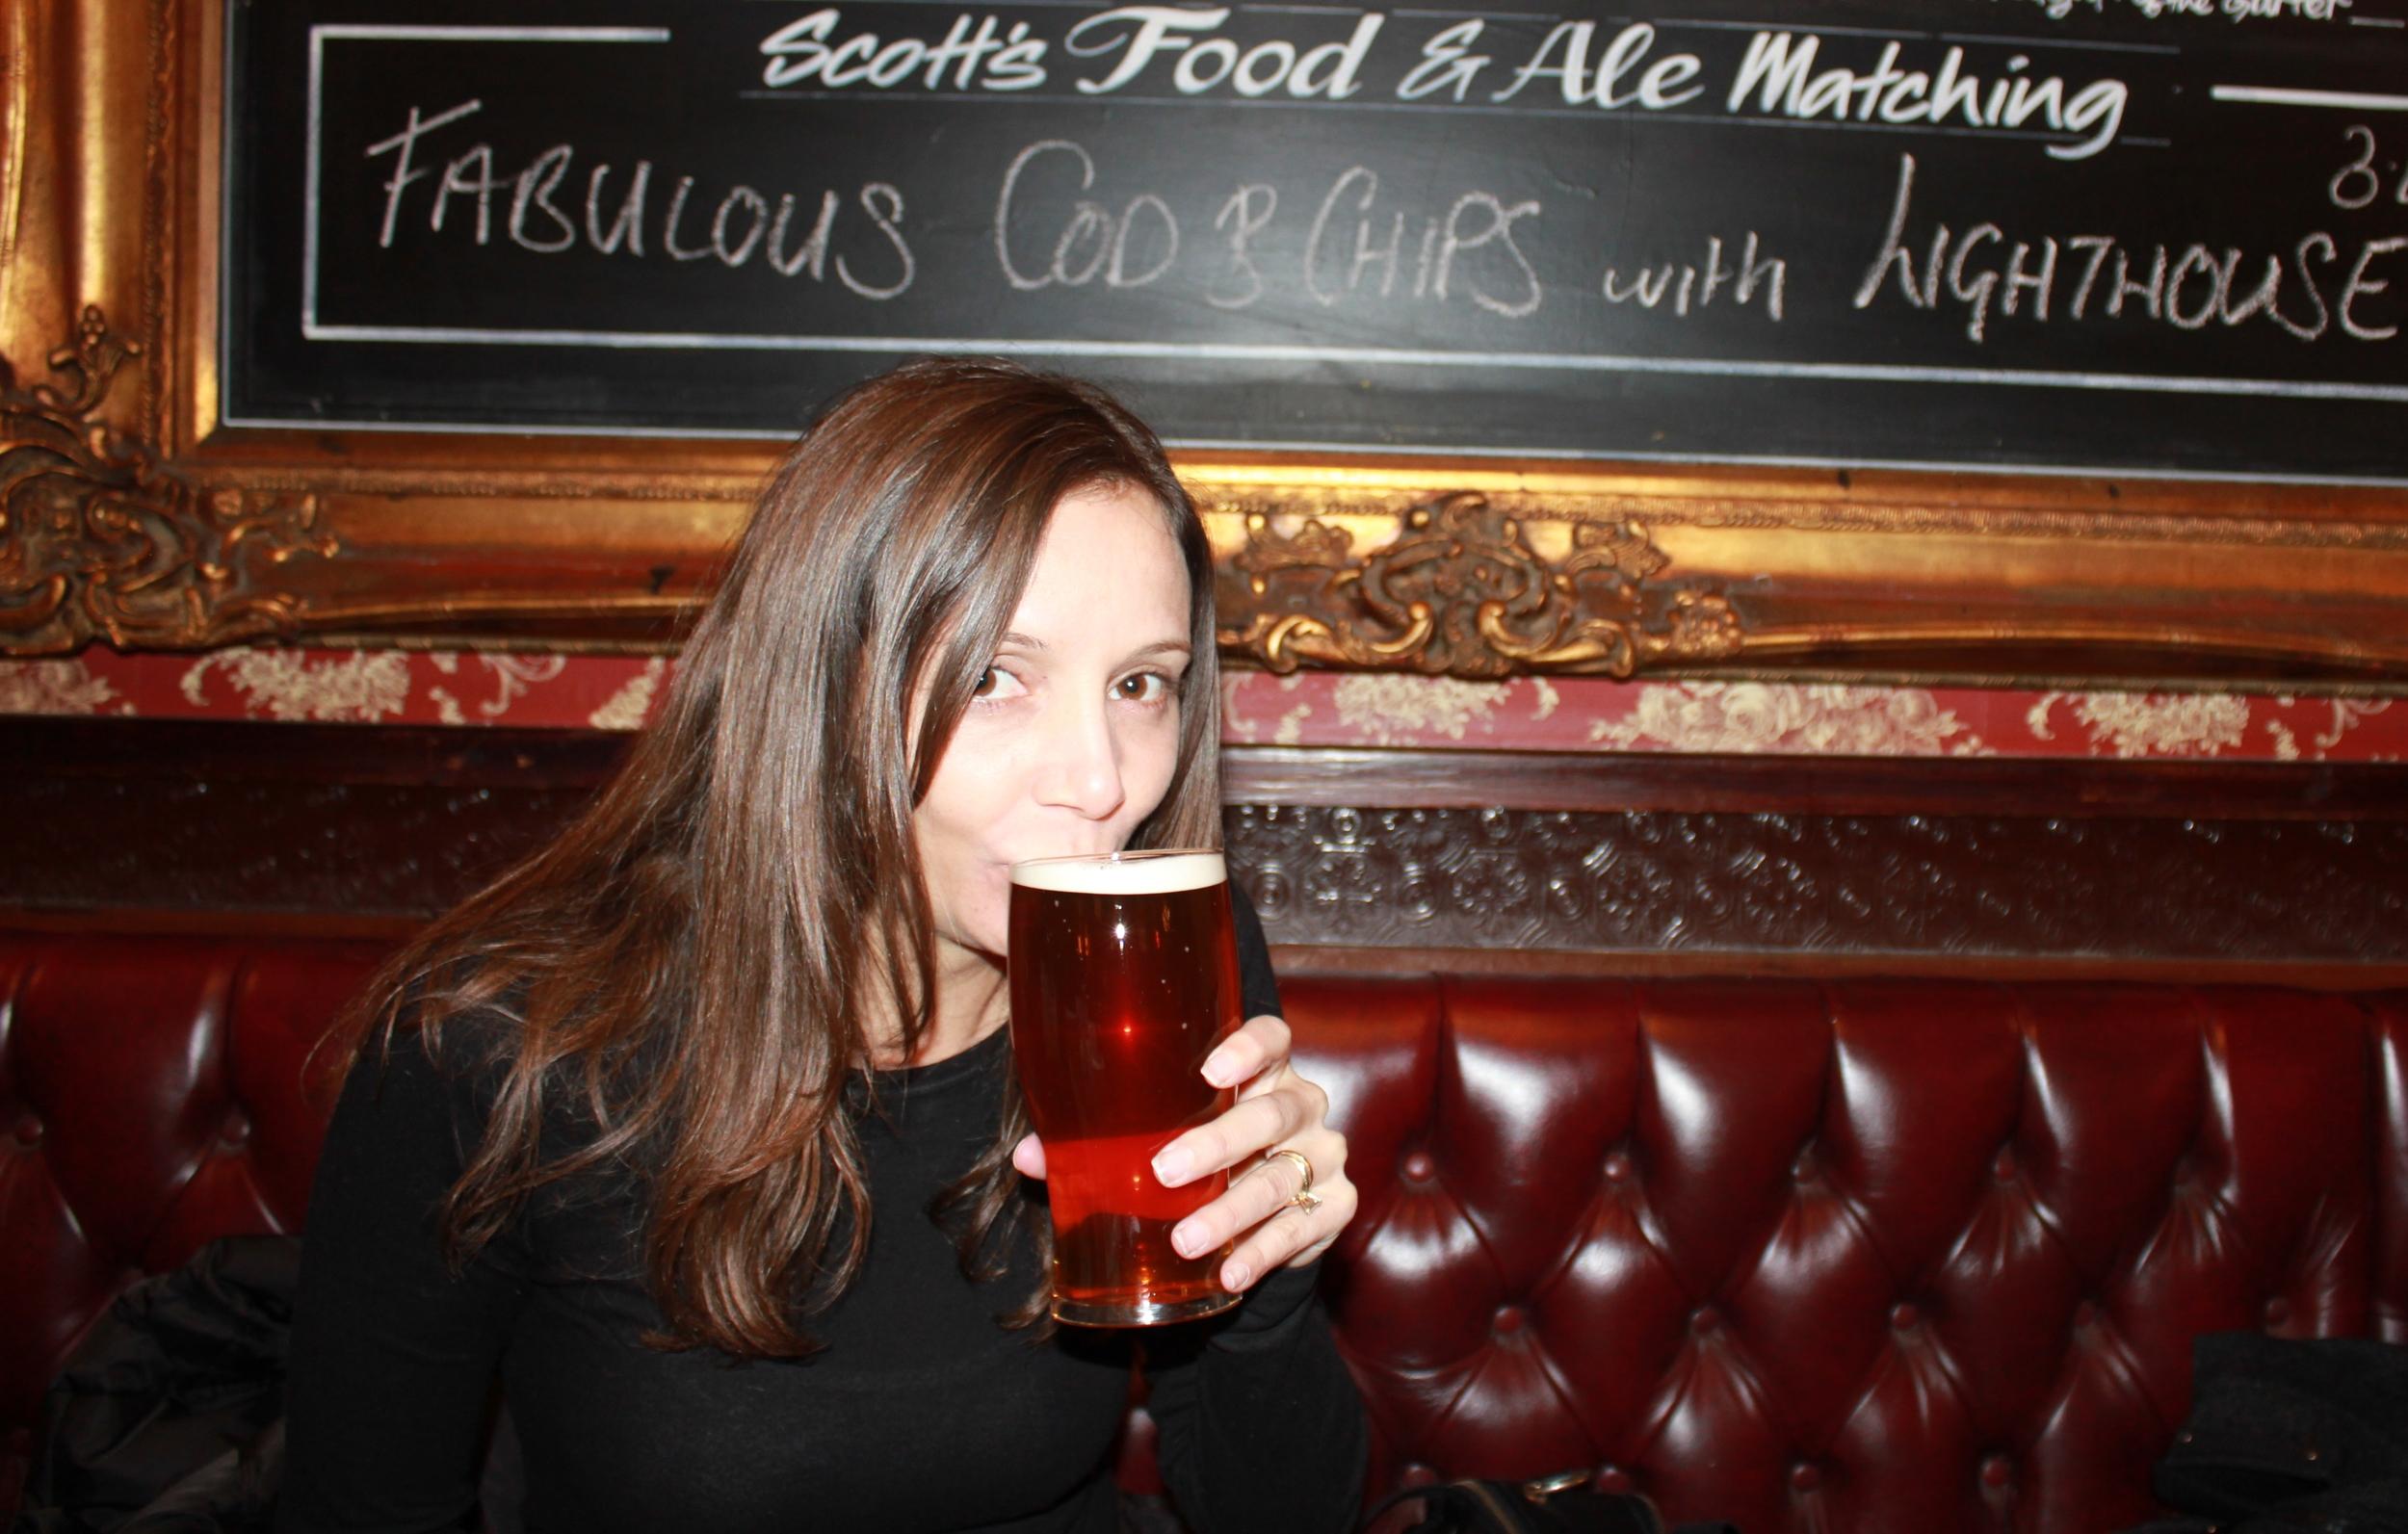 Princess of Wales Pub, London, England